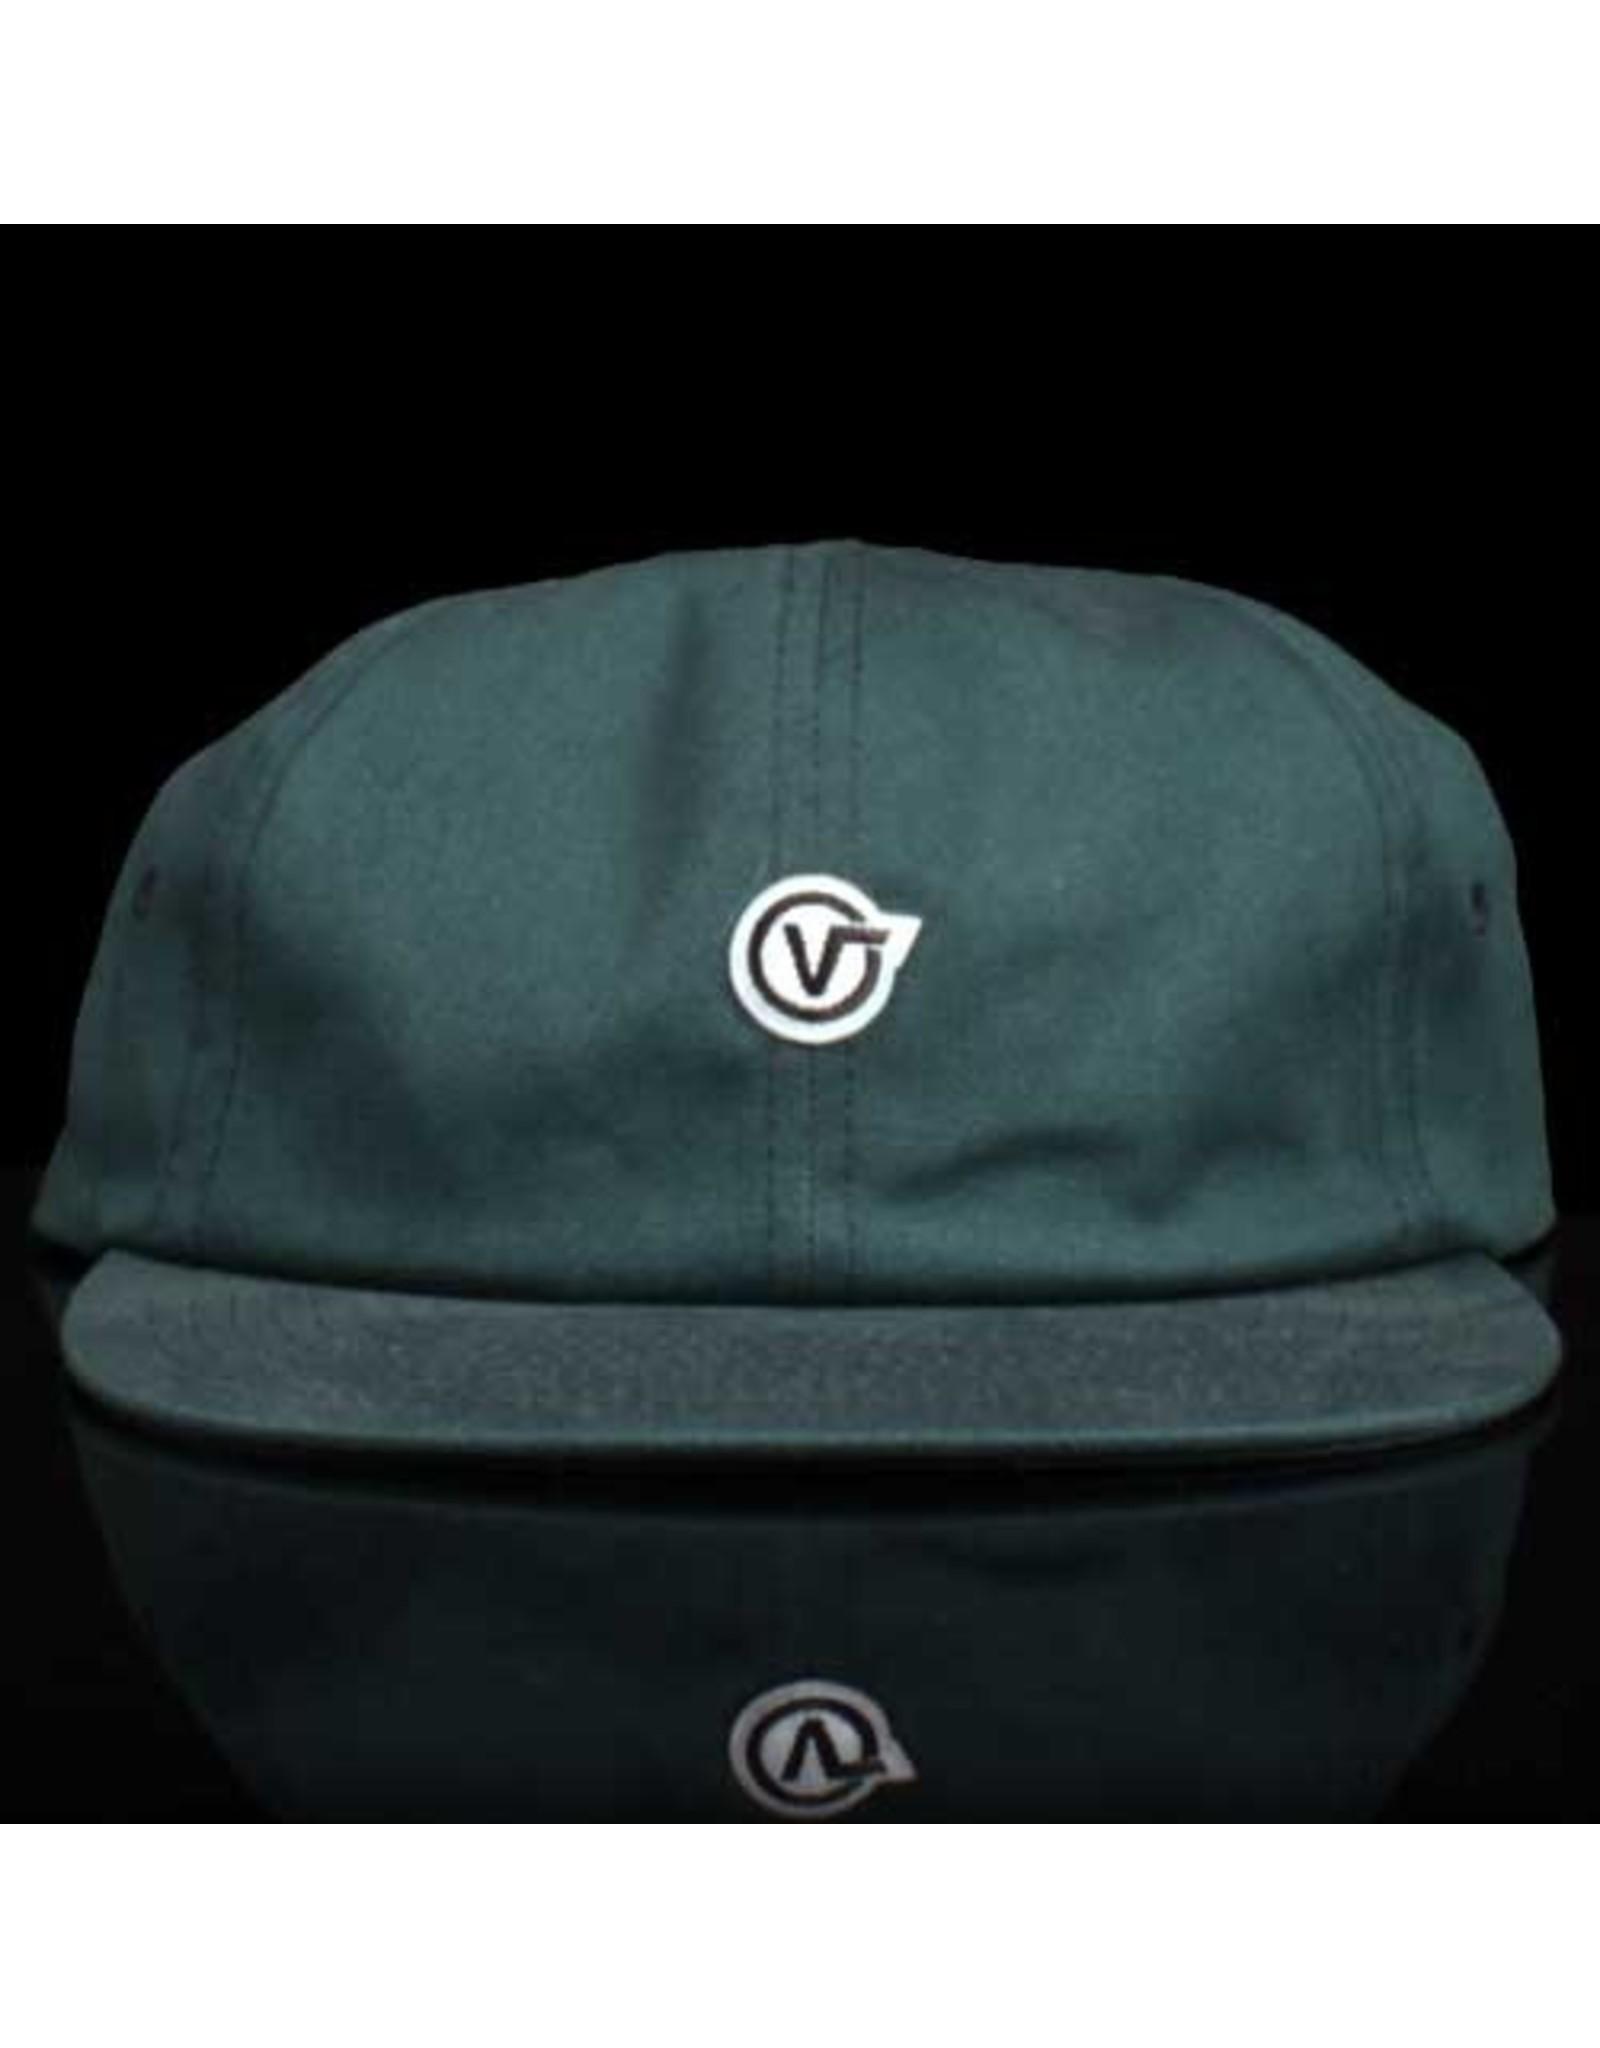 VANS Vans Hat Jockey 6 Panel Strapback Green